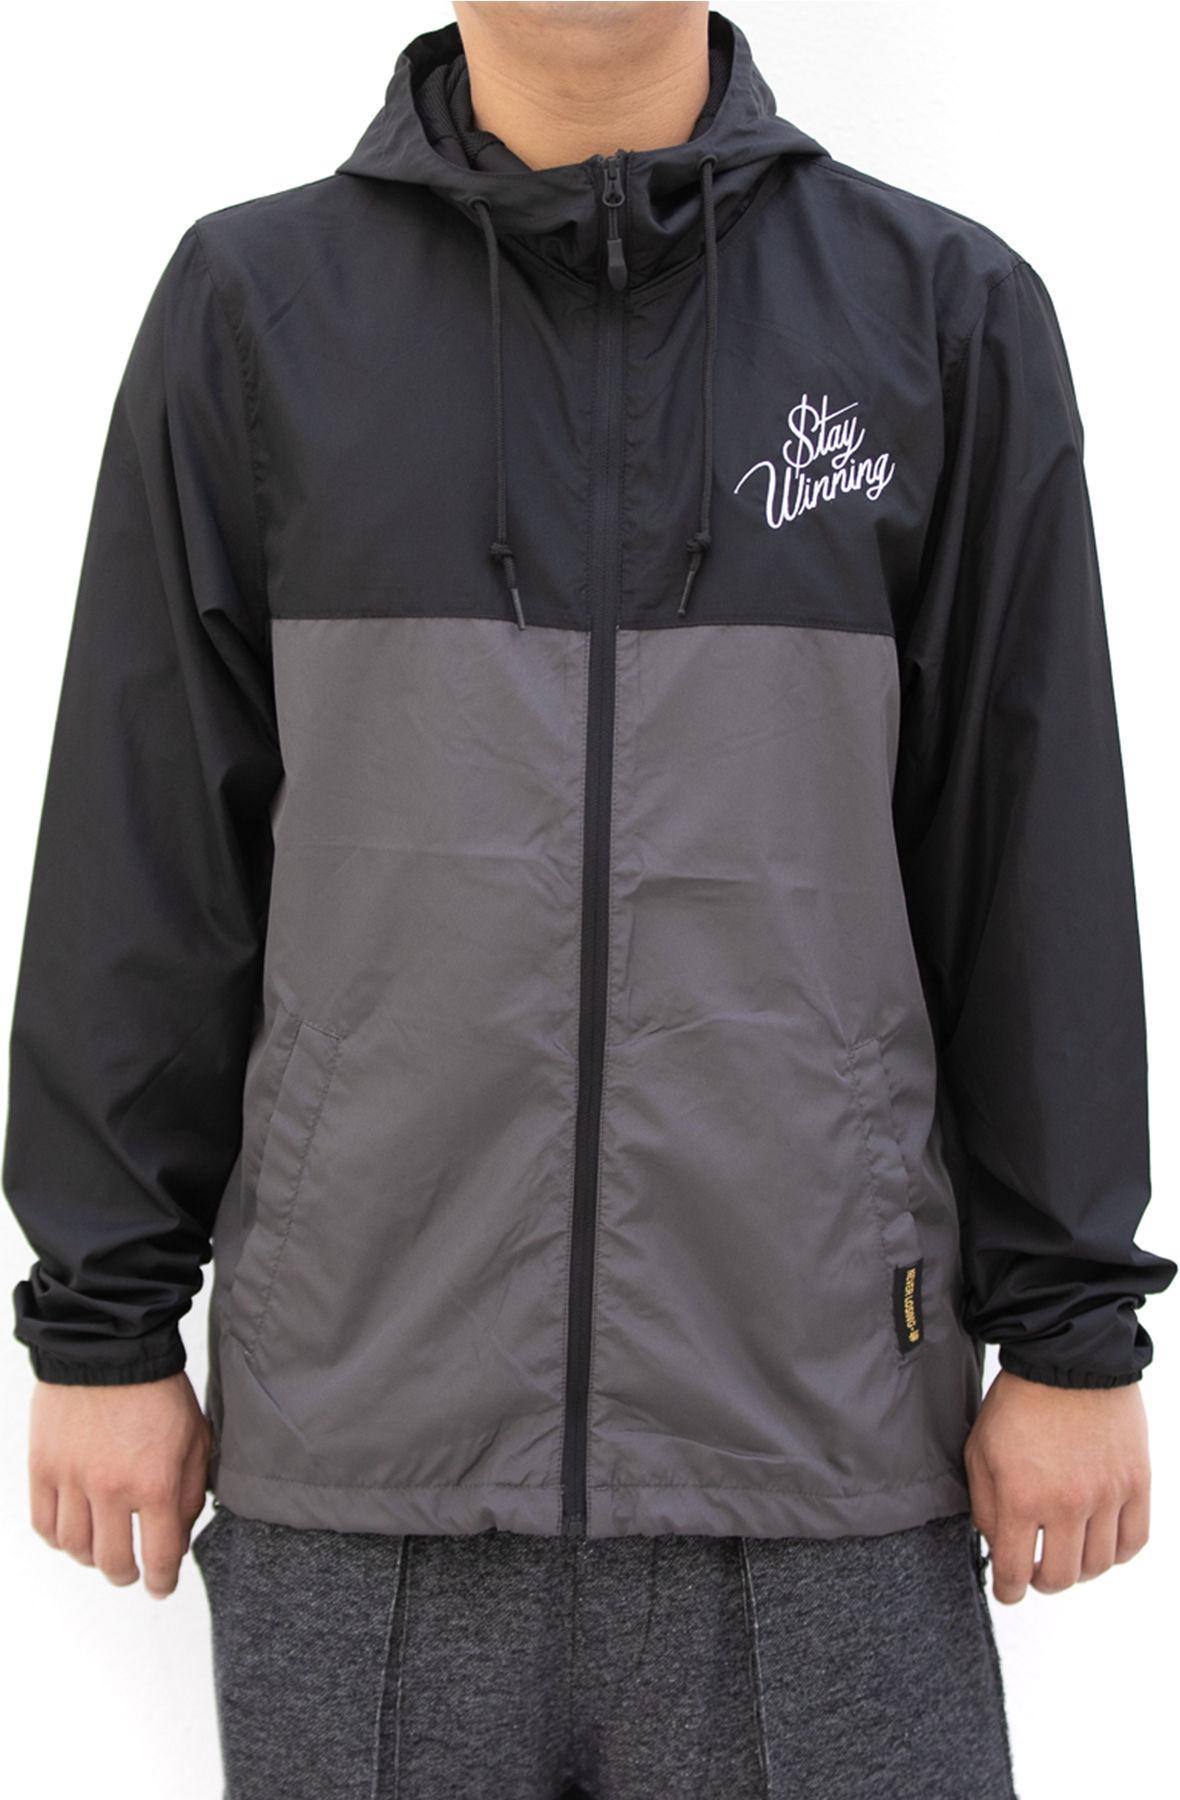 Image of Stay Winning Script Embroidered Black/Gray Windbreaker Jacket